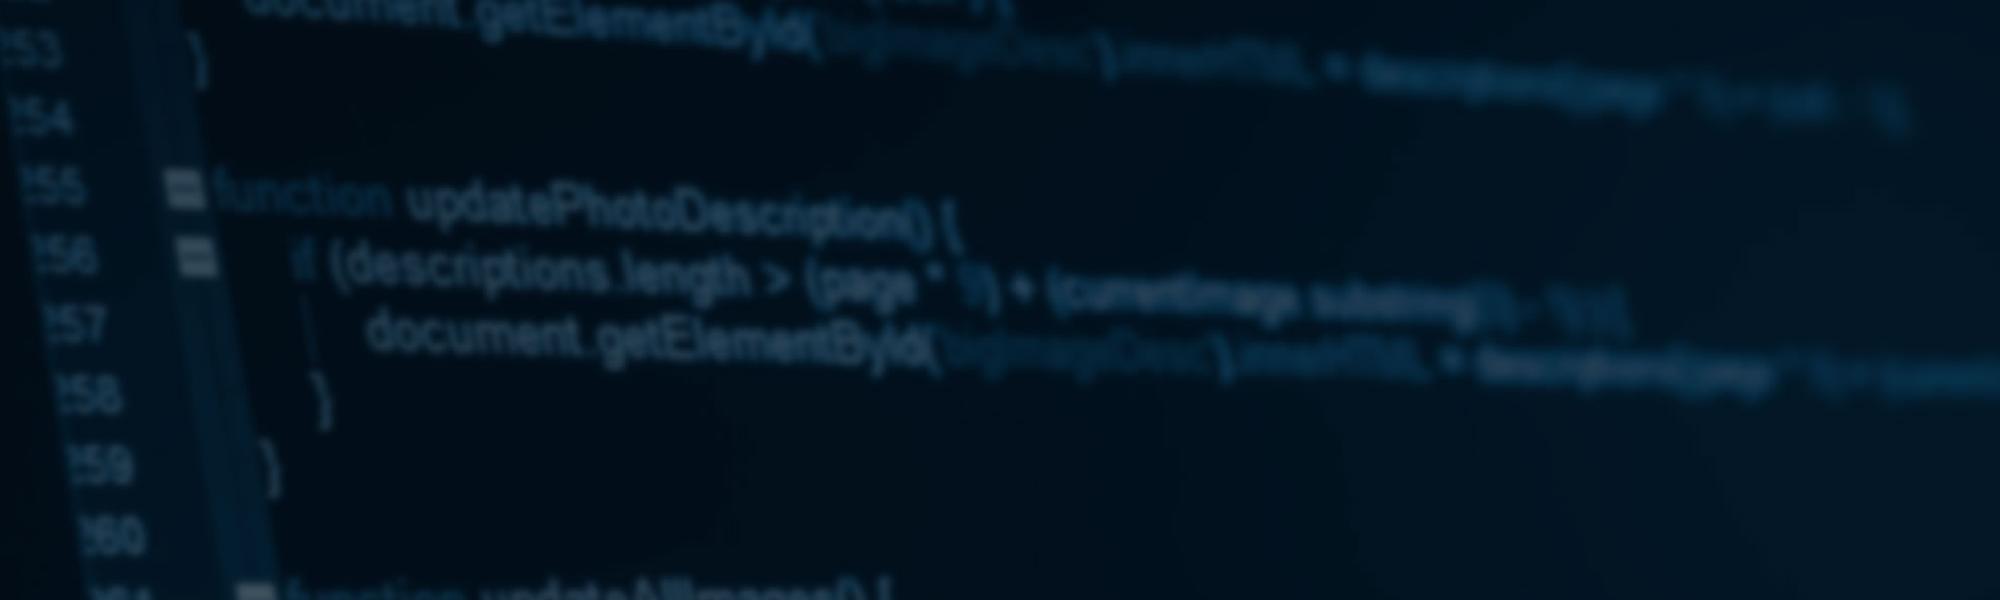 header_code